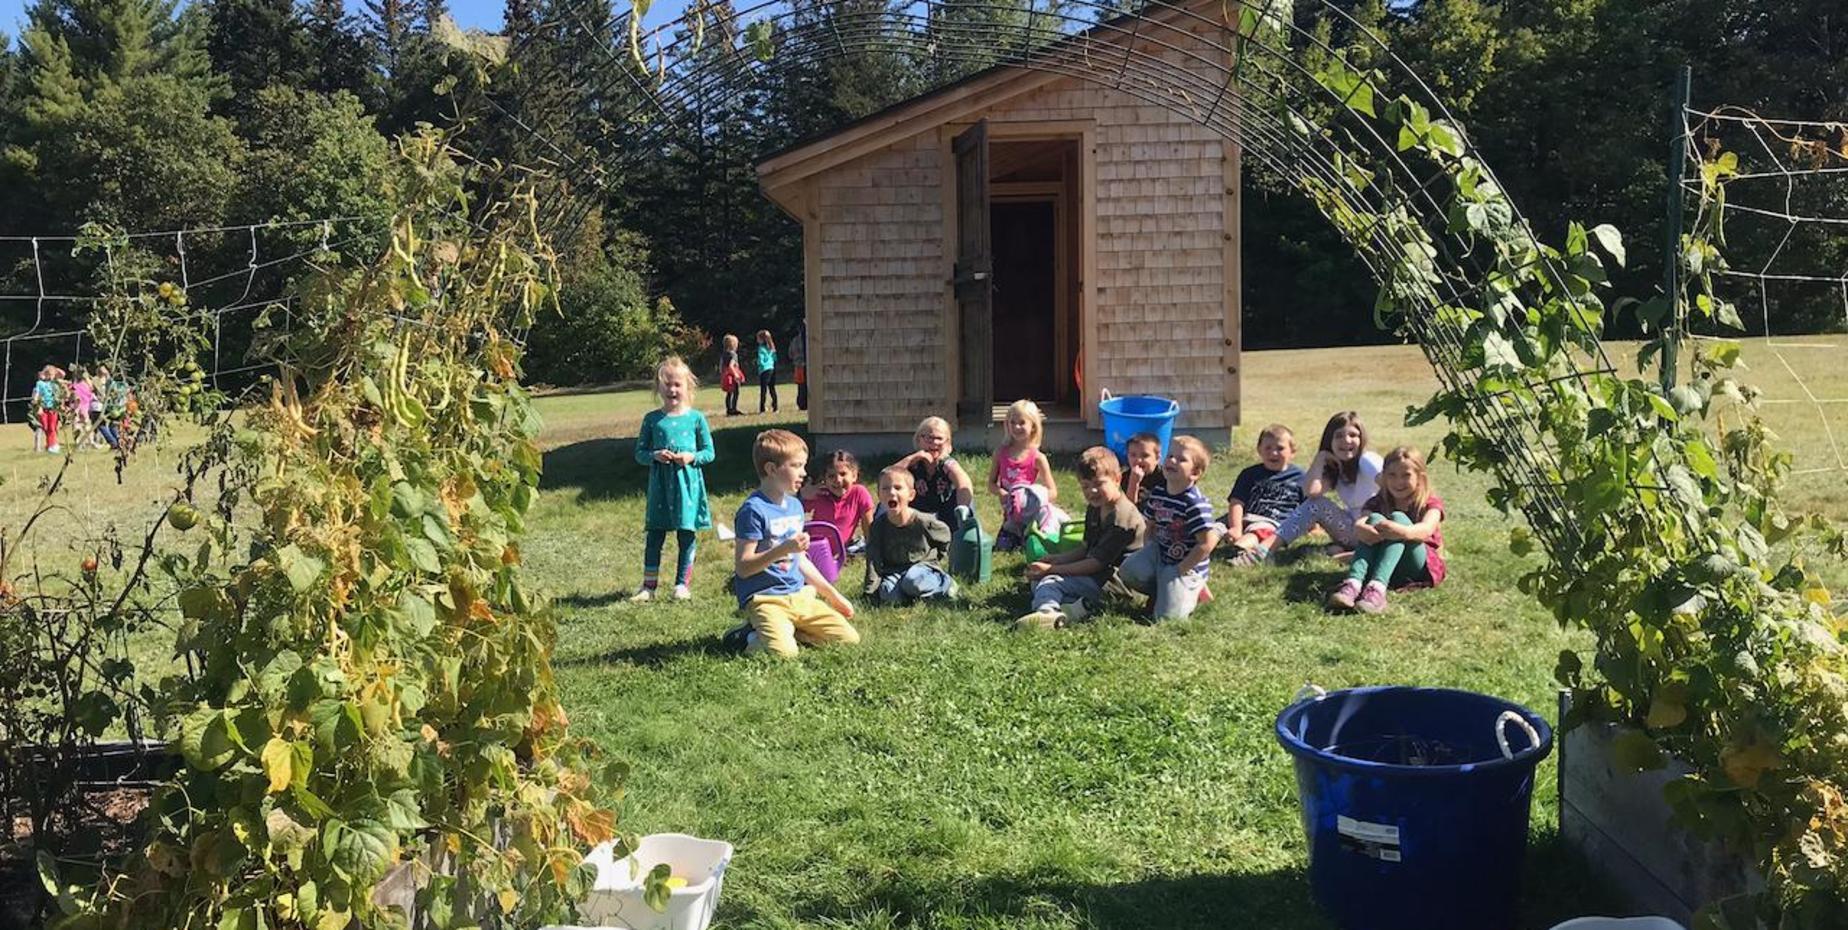 students outside in a garden